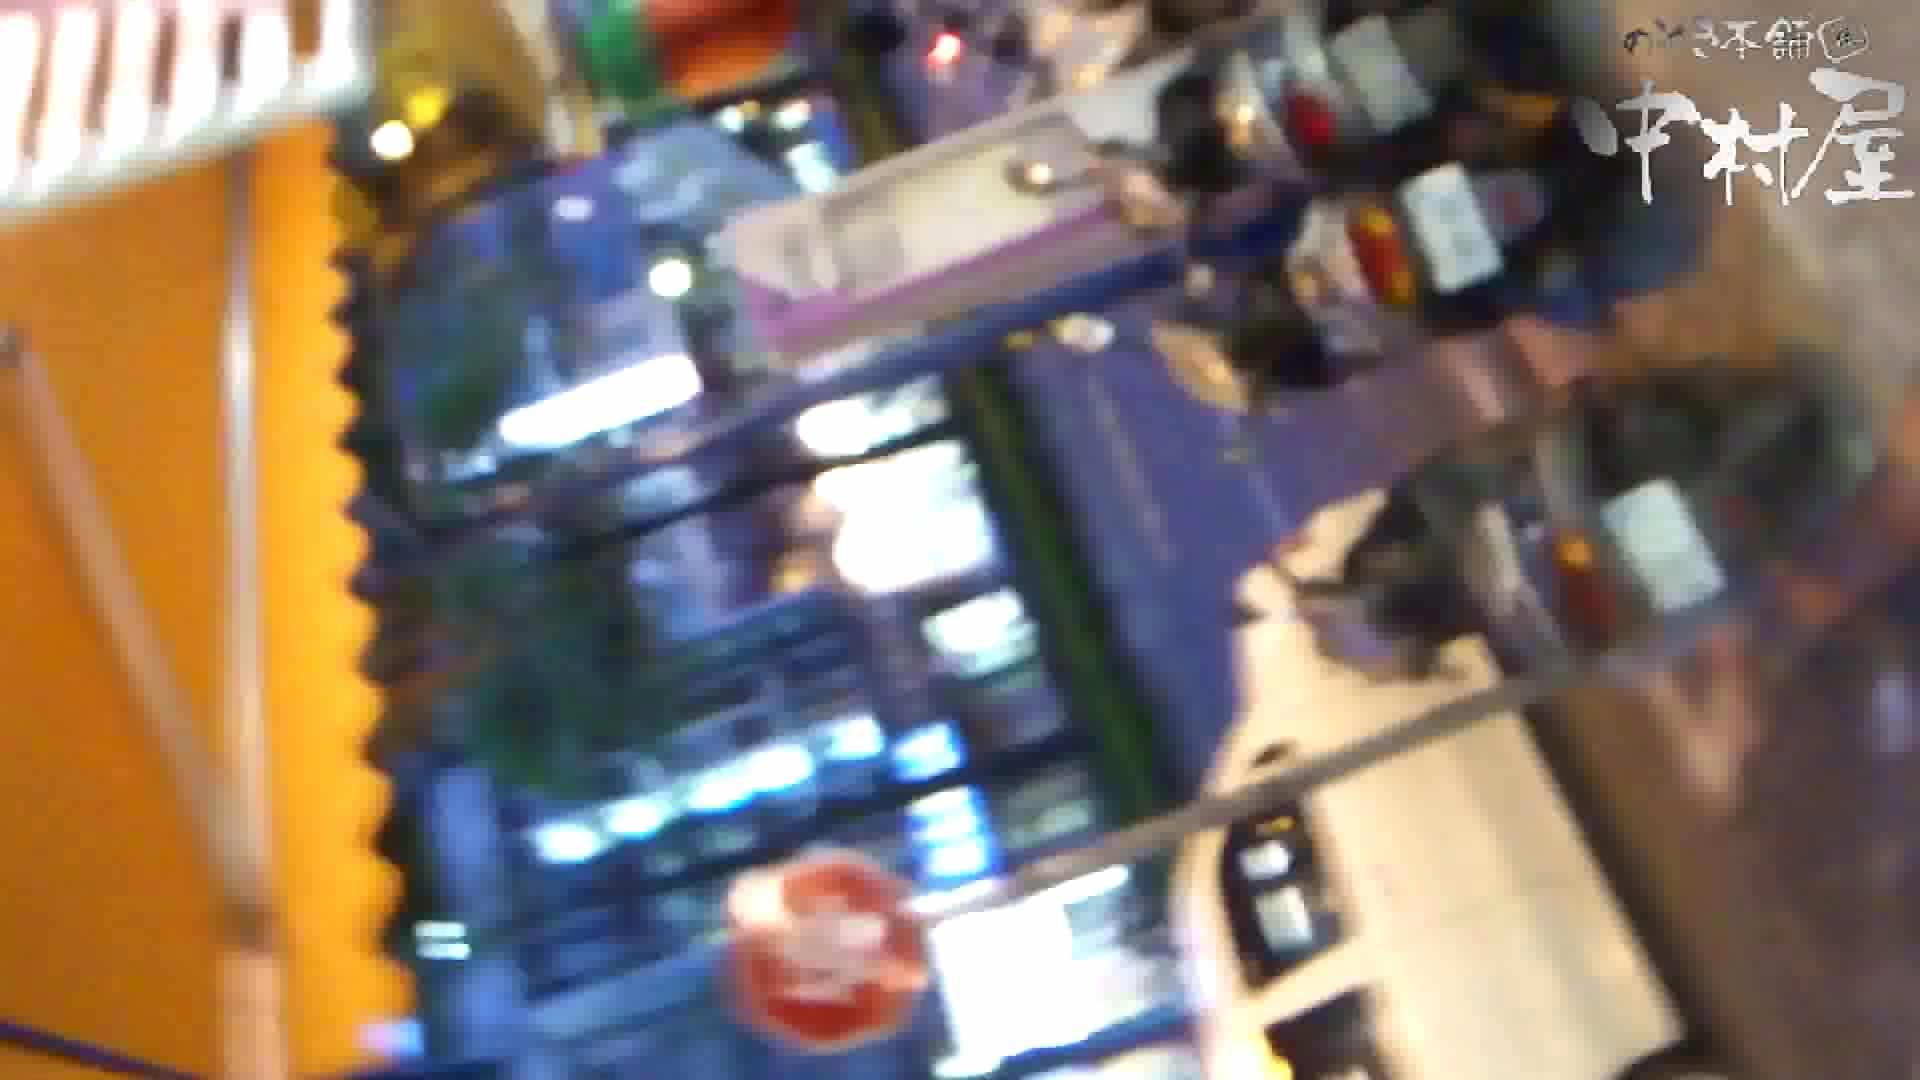 GOD HAND ファッションショッピングセンター盗撮vol.08 盗撮特撮 えろ無修正画像 12pic 5